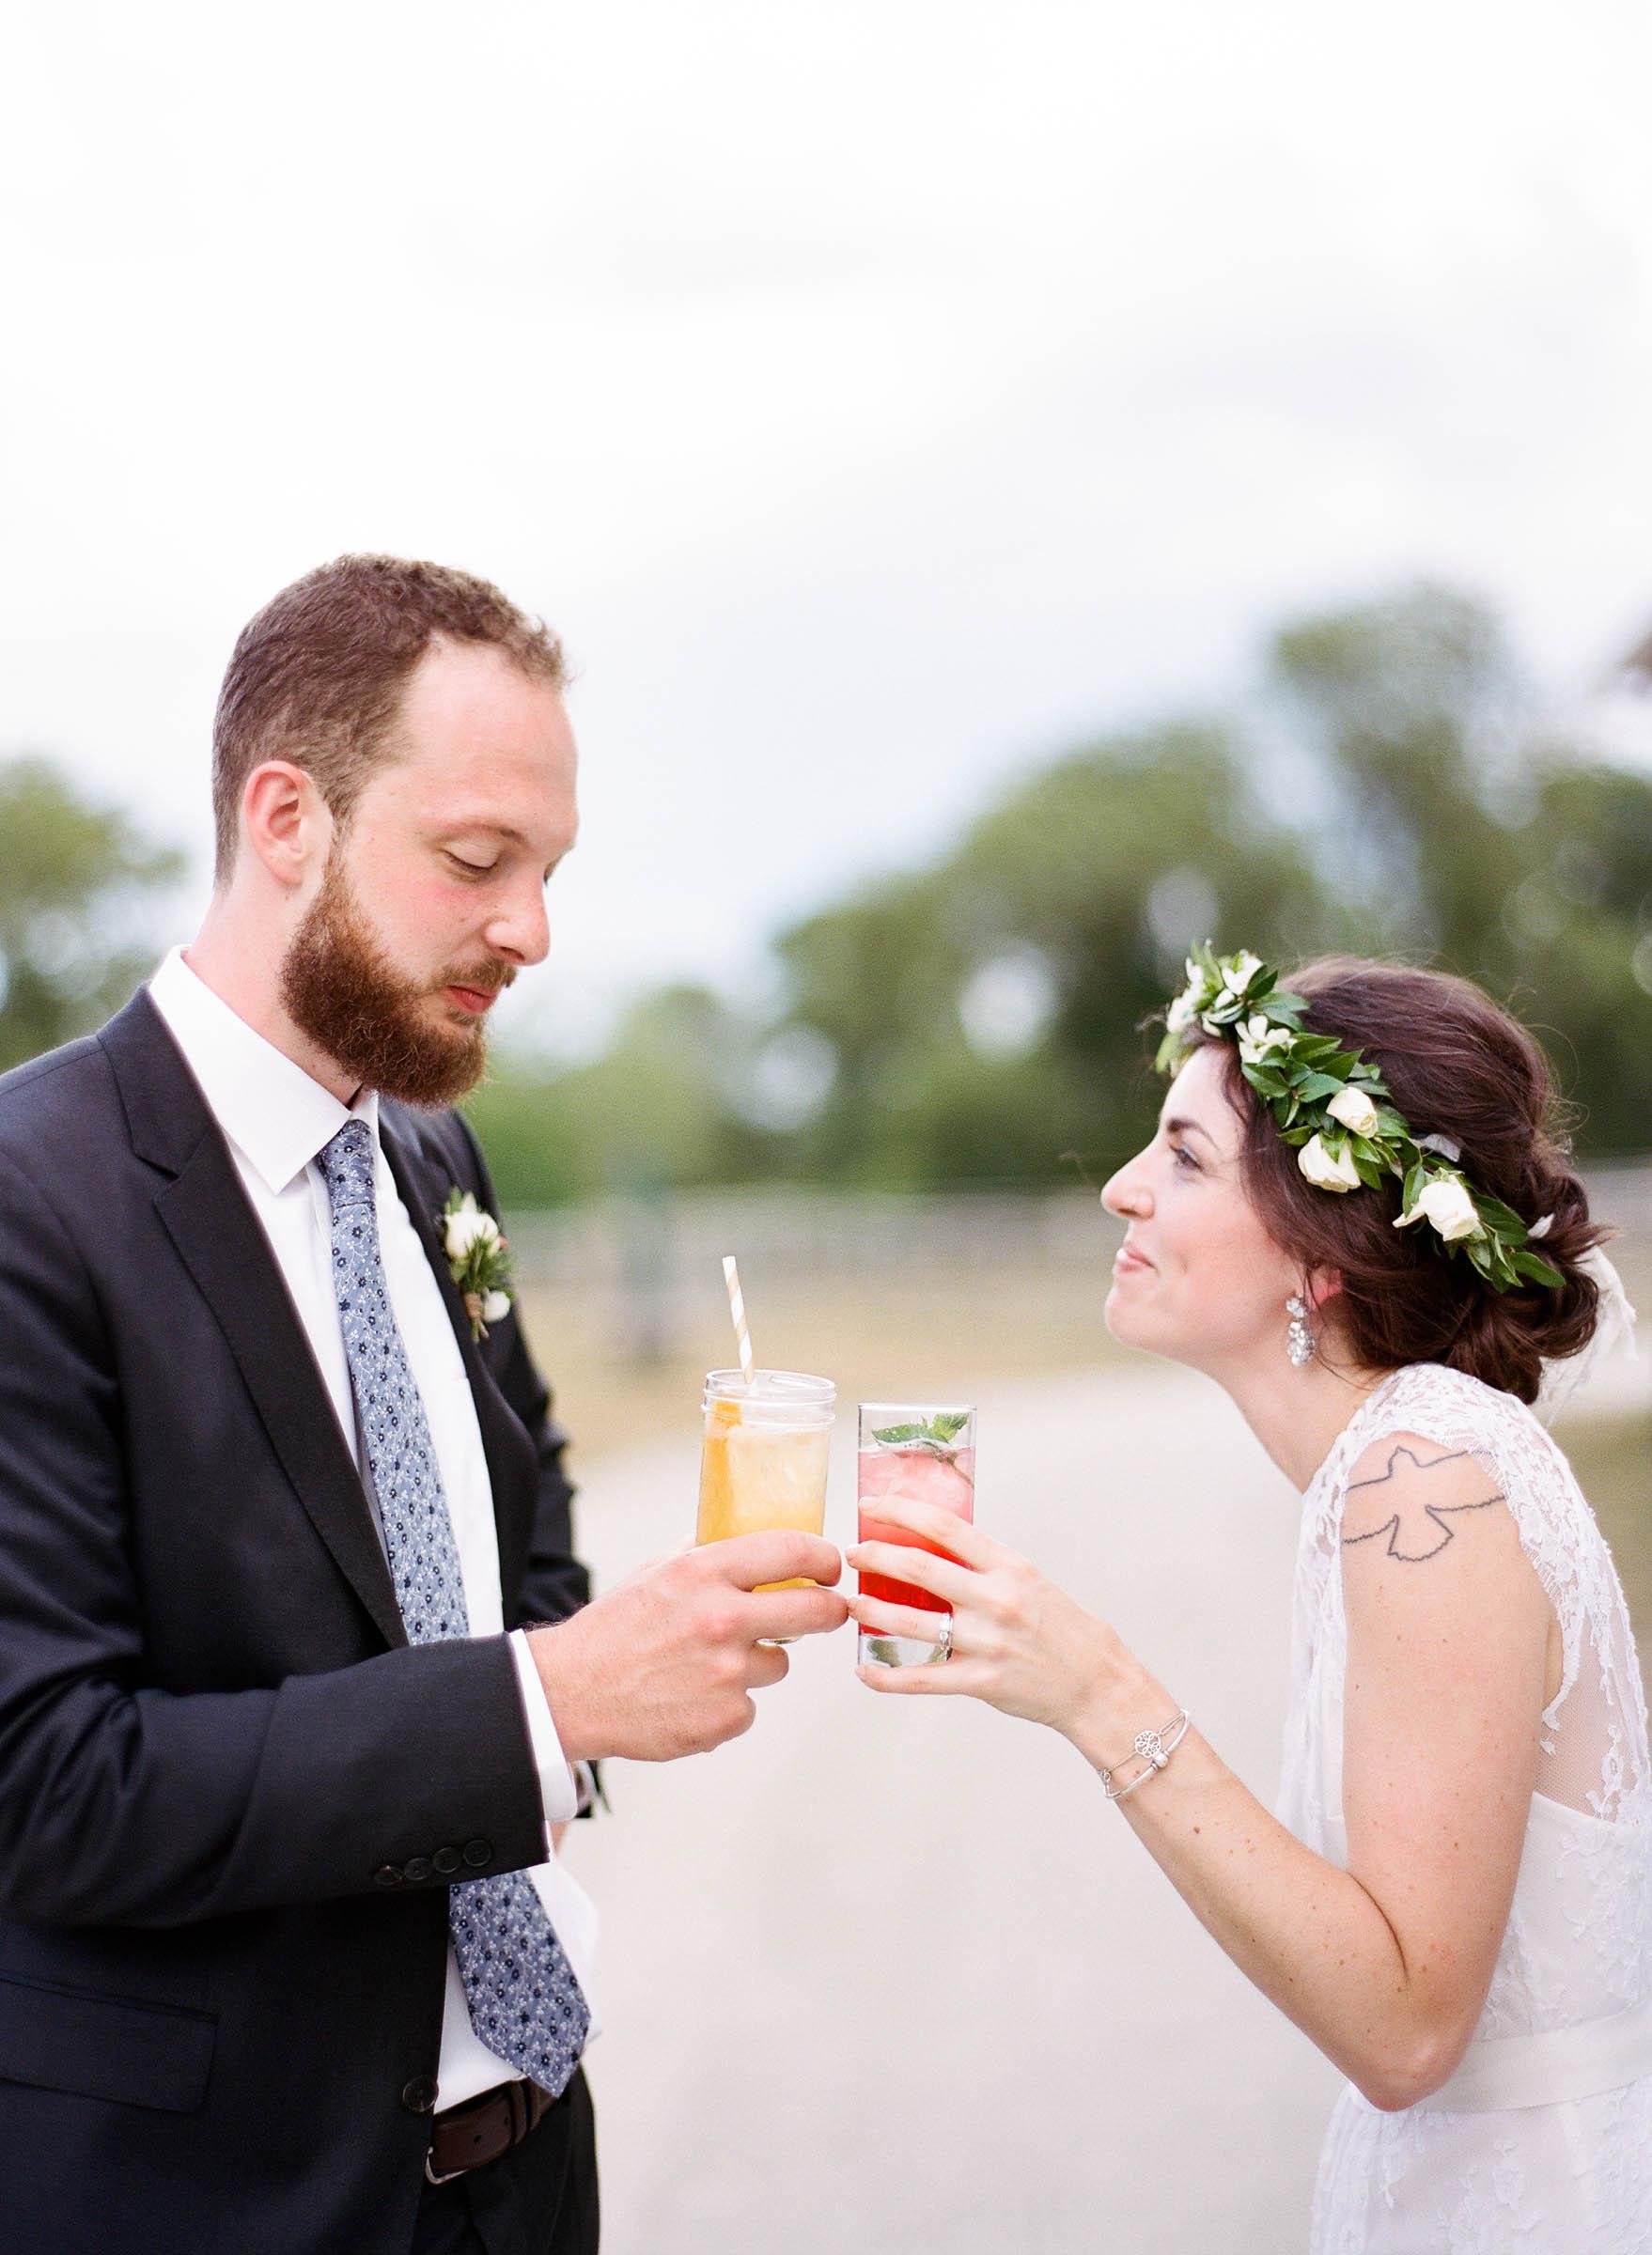 Concord-Wedding-Photography-56.jpg